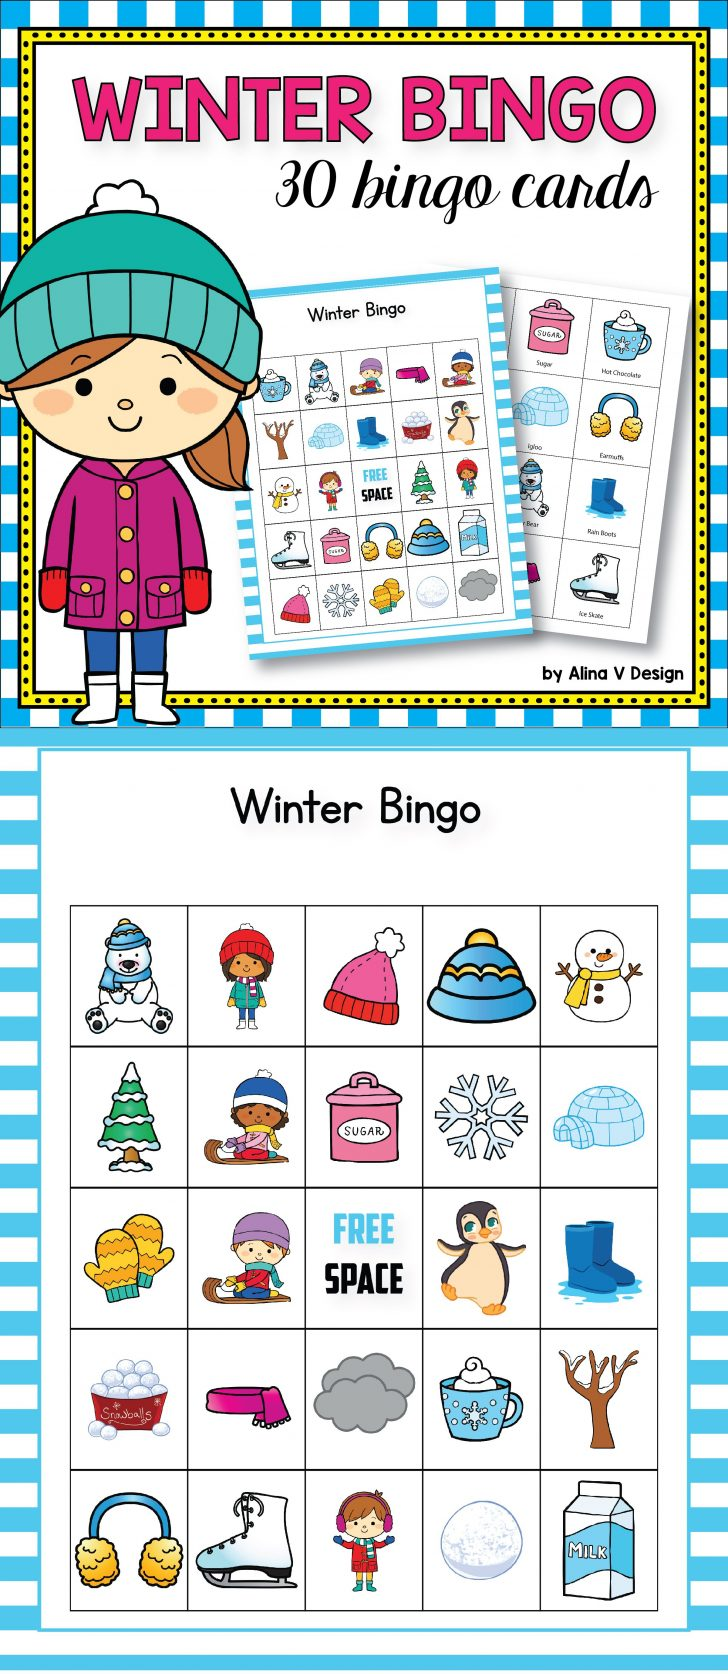 Printable Winter Bingo Cards Free